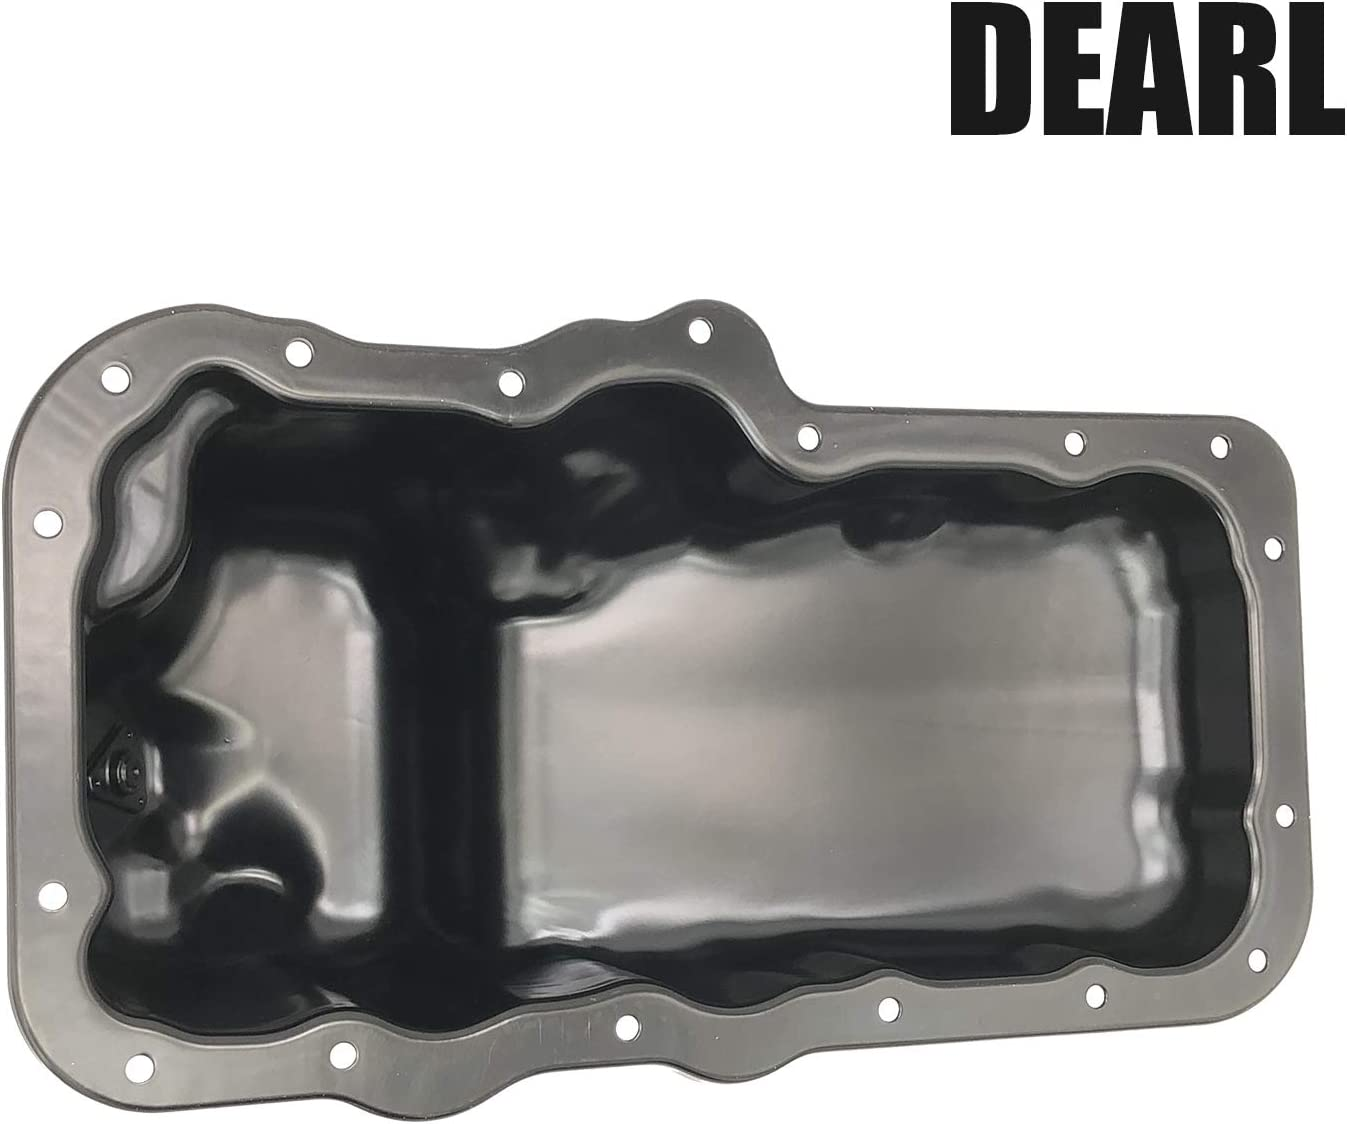 02-12 Liberty 02 03 04 05 06 07 08 09 10 11 12 13 07-11 Nitro 11-12 1500 Engine Oil Pan W//Drain Plug for V6 3.7L 04-05 Dakota 02-10 Ram 1500 Pickup